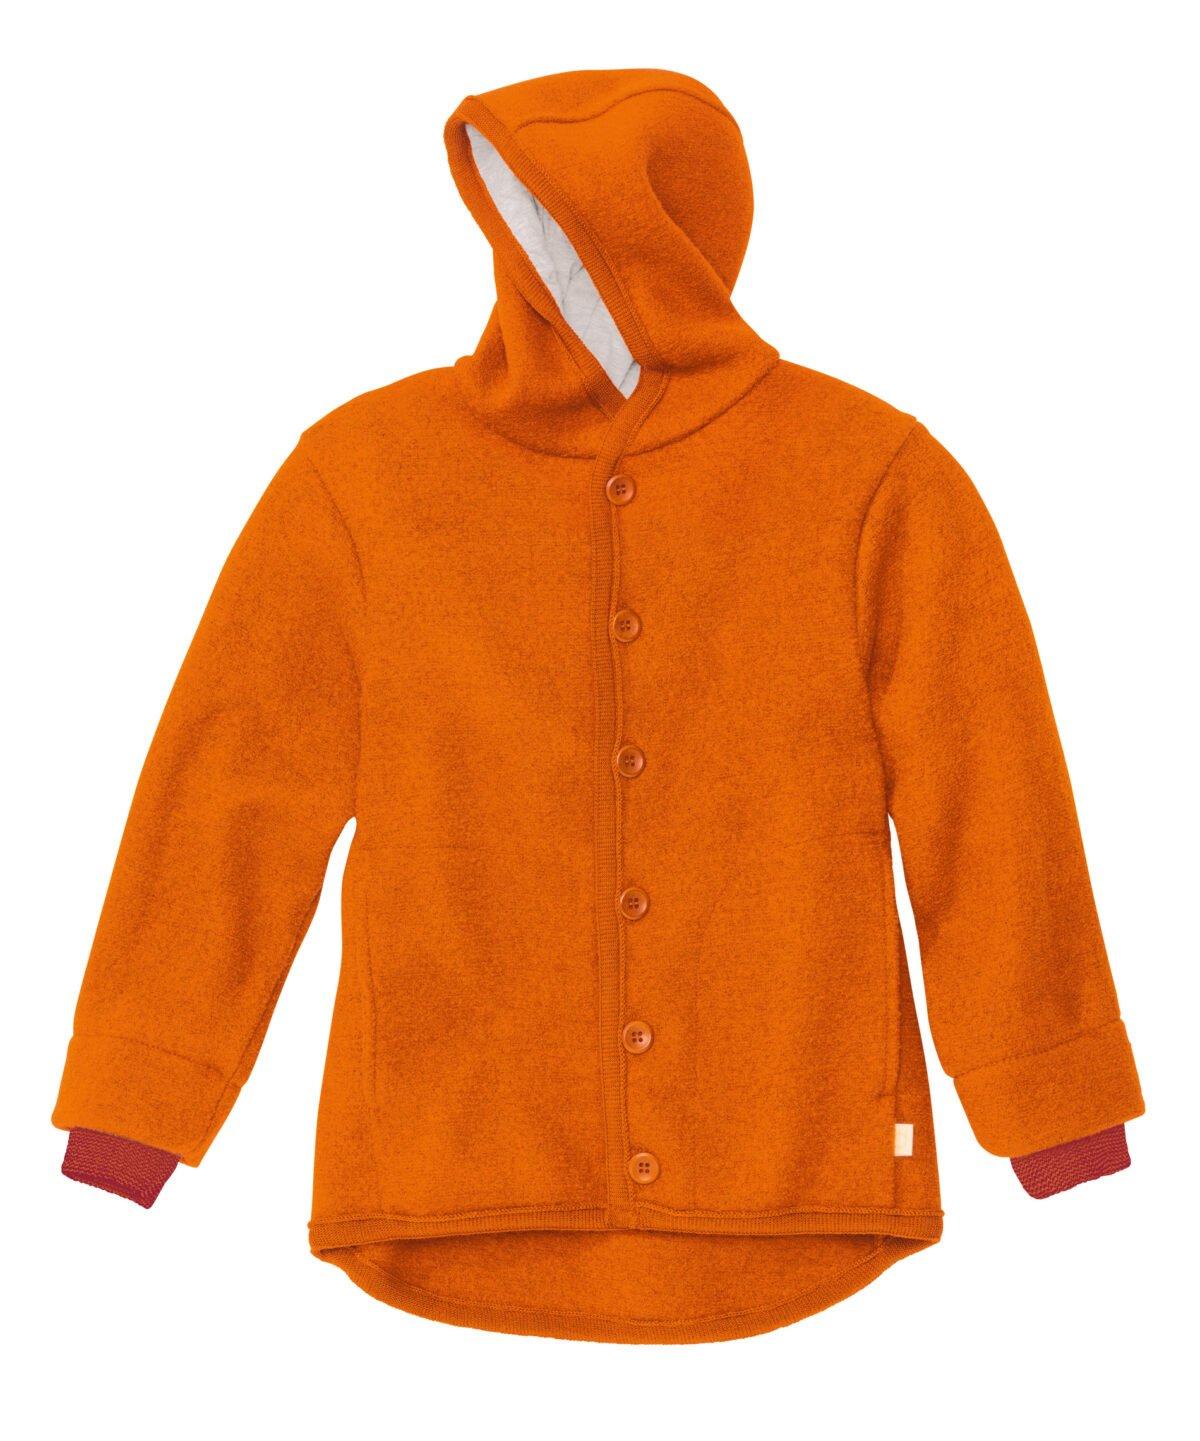 Jachetă Disana din lână merinos boiled wool Orange